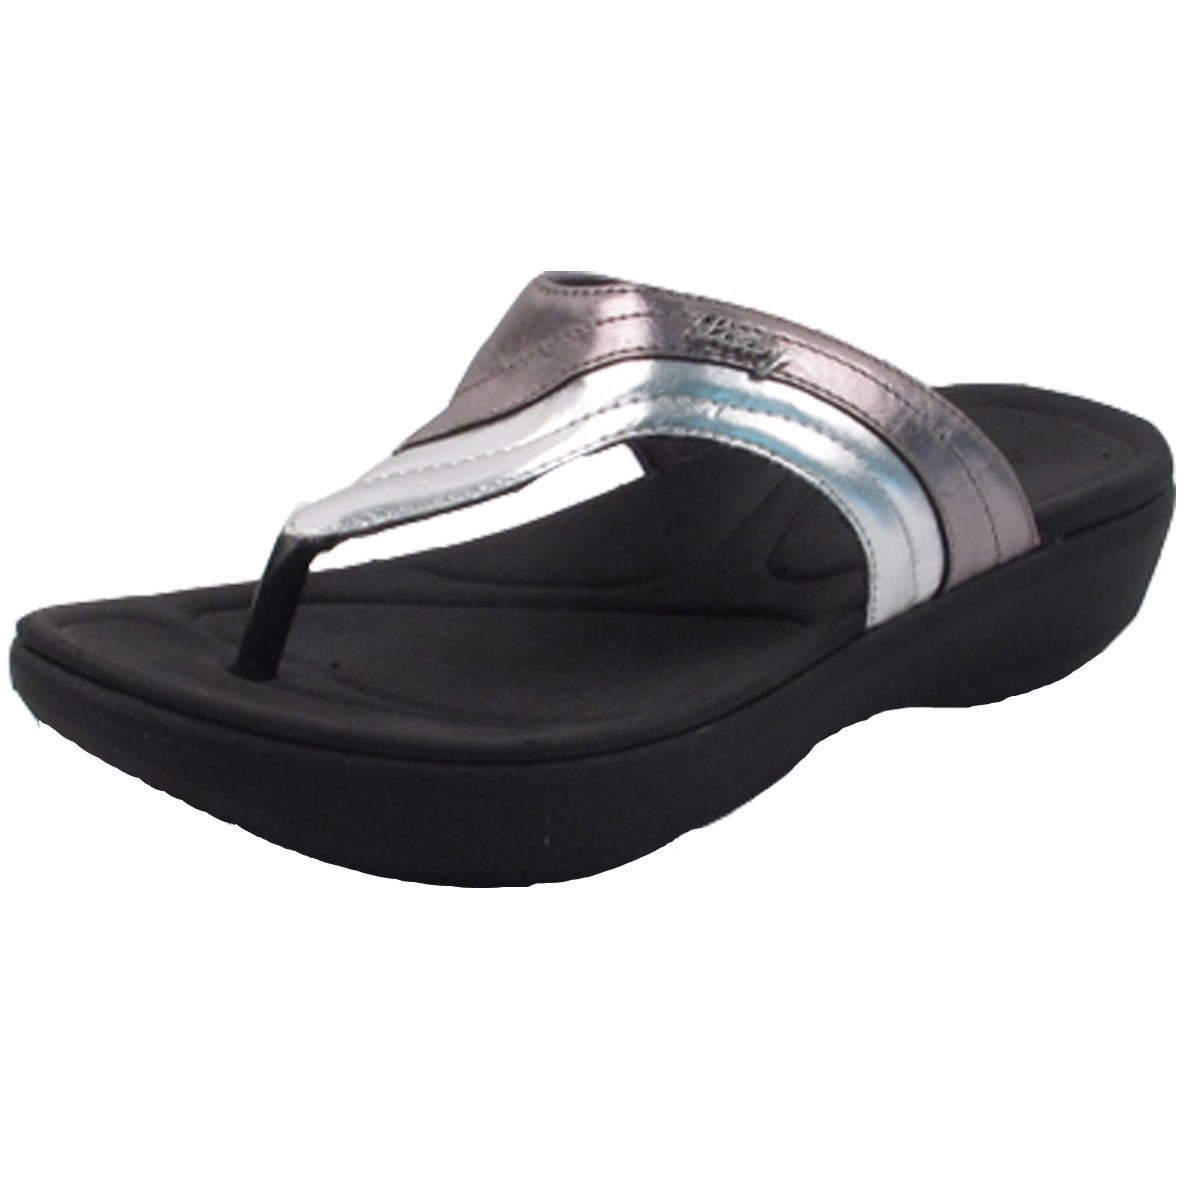 Gold Pigeon Shoes GP7530W Women Flip Flop: 8518 Silver Bronze, EU39